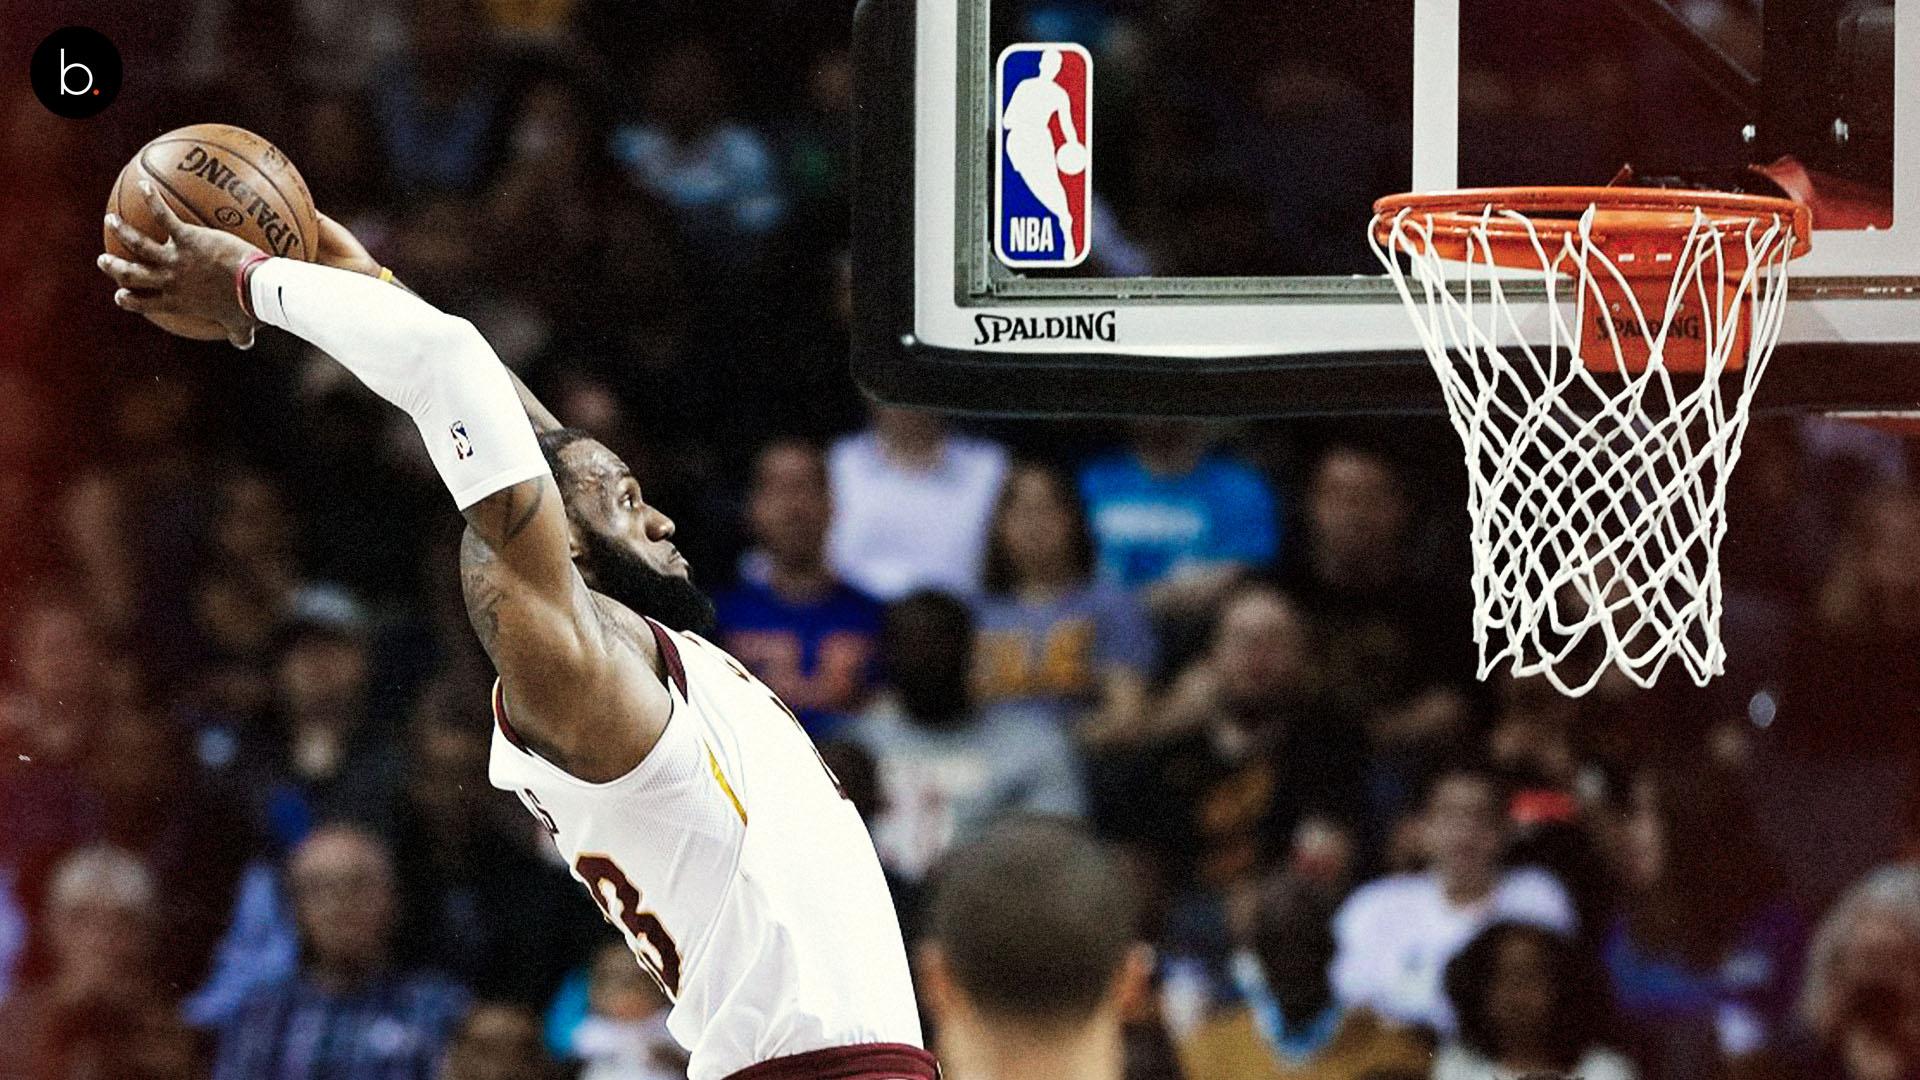 NBA: DeMarcus Cousins ficha por Golden State Warriors